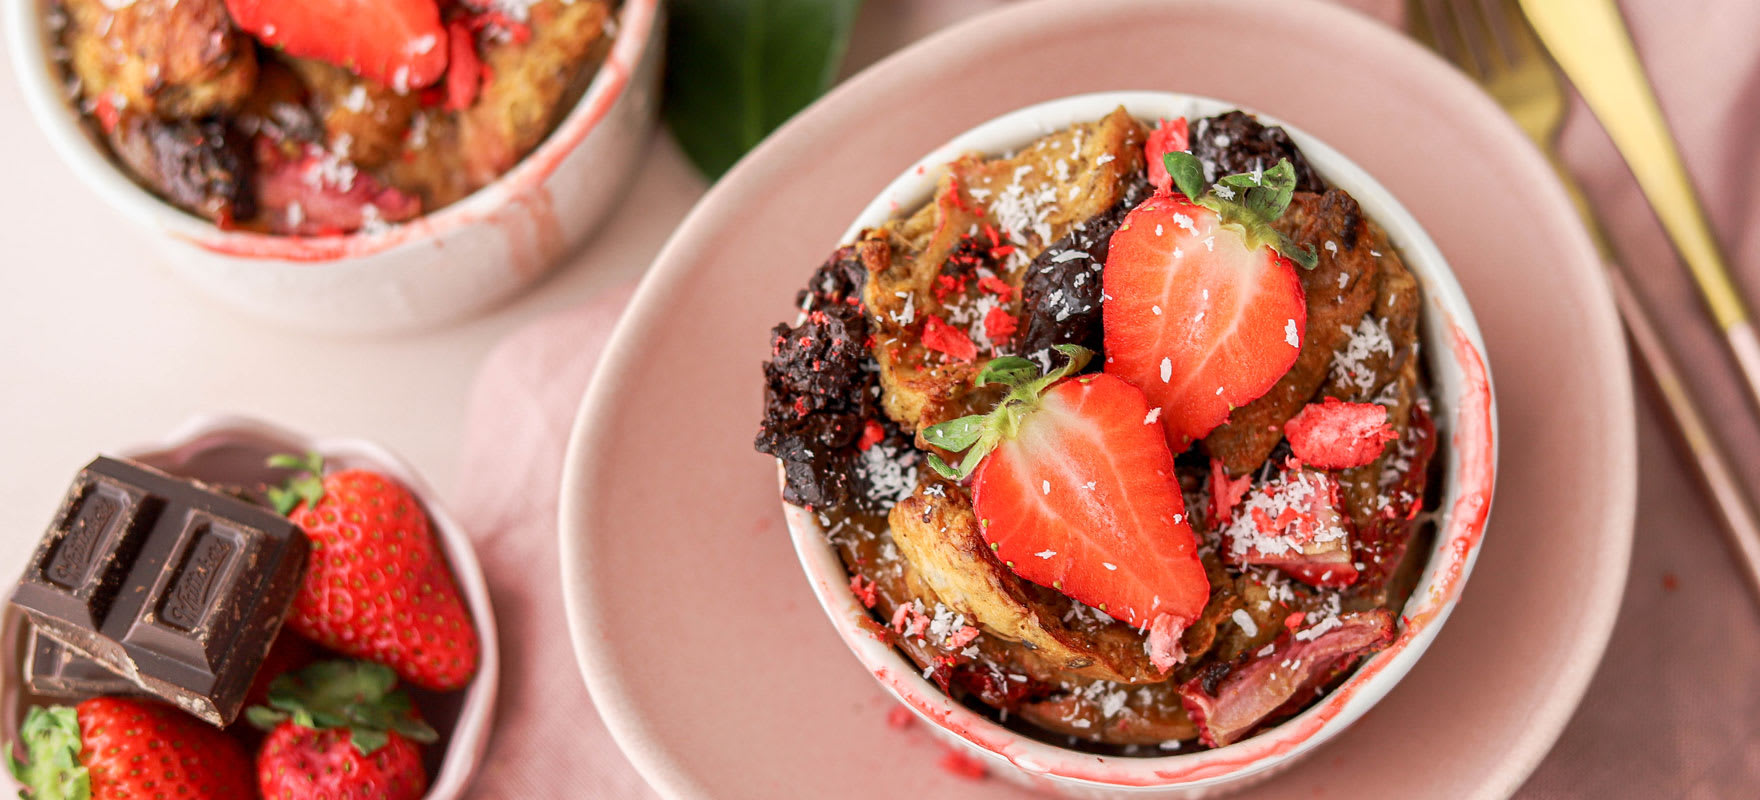 Choc-berry baked french toast image 1